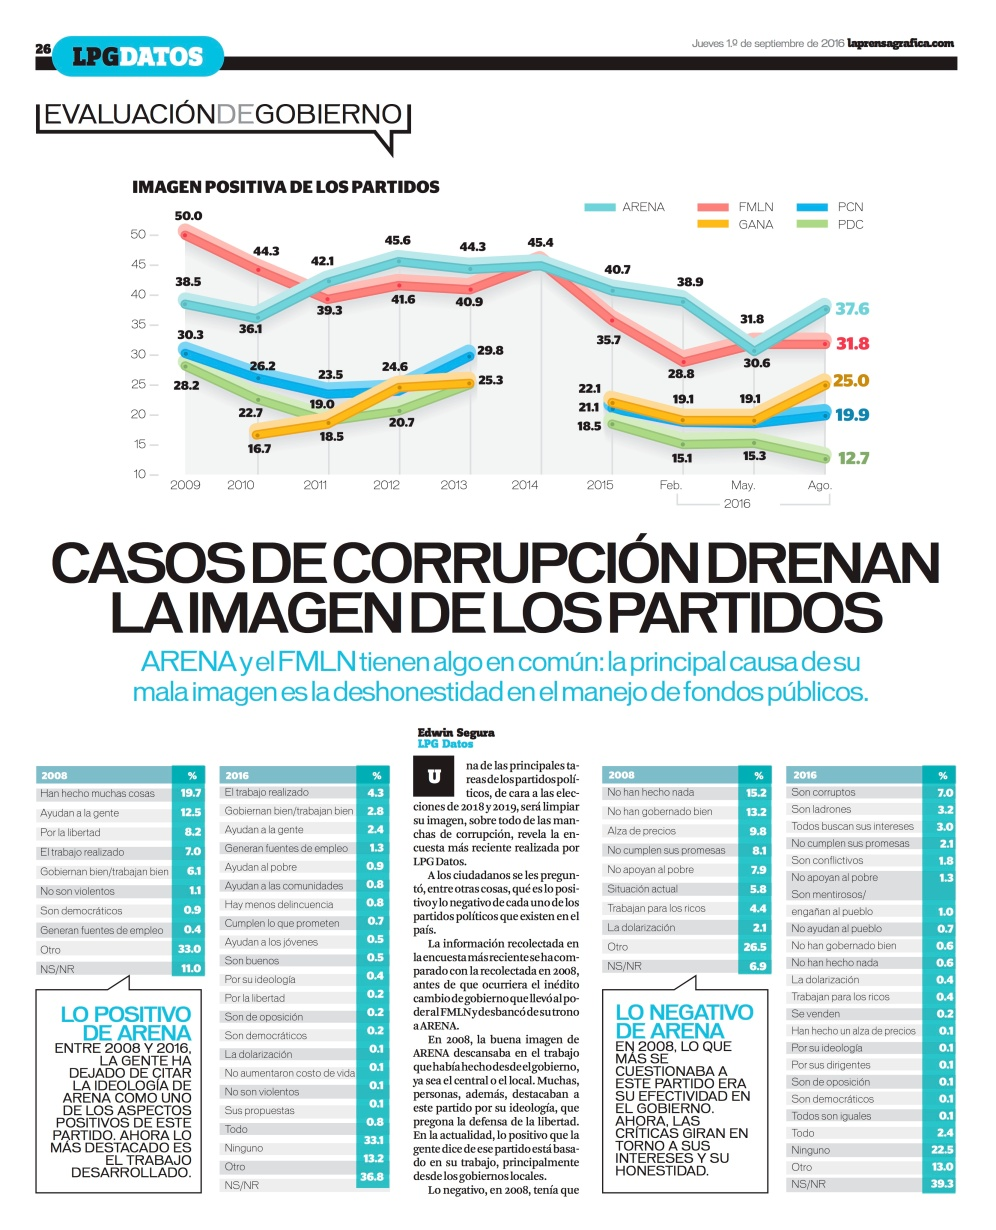 LPG20160901 - La Prensa Gráfica - PORTADA - pag 26